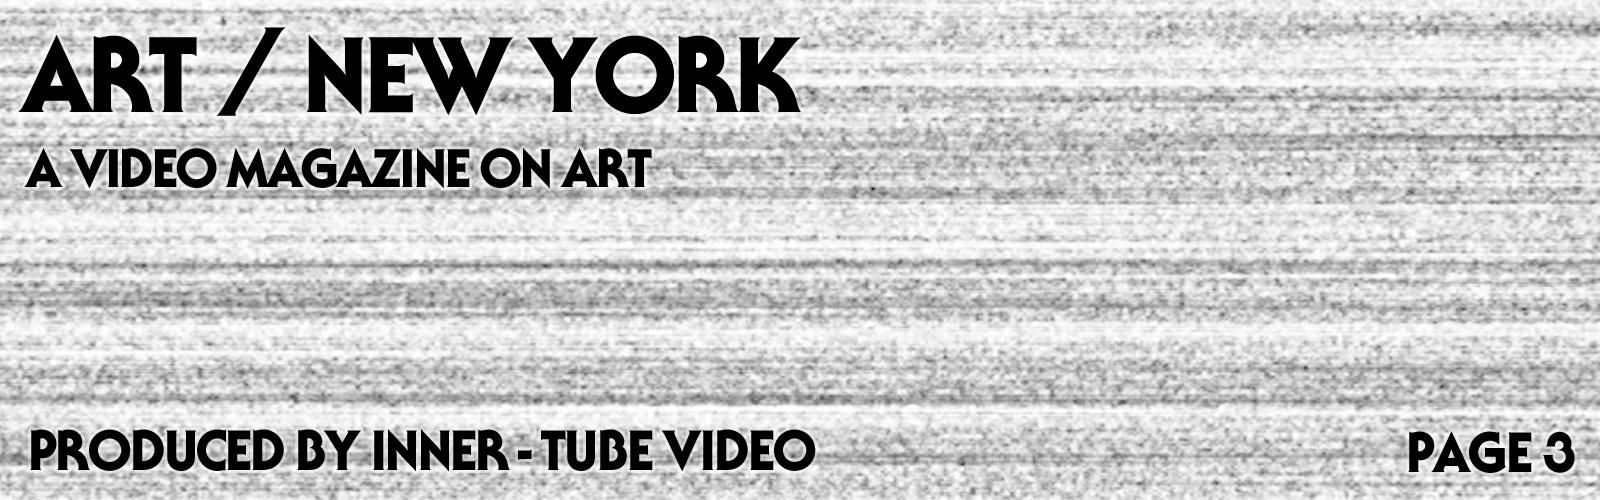 art-newyork-cover-page3.jpg